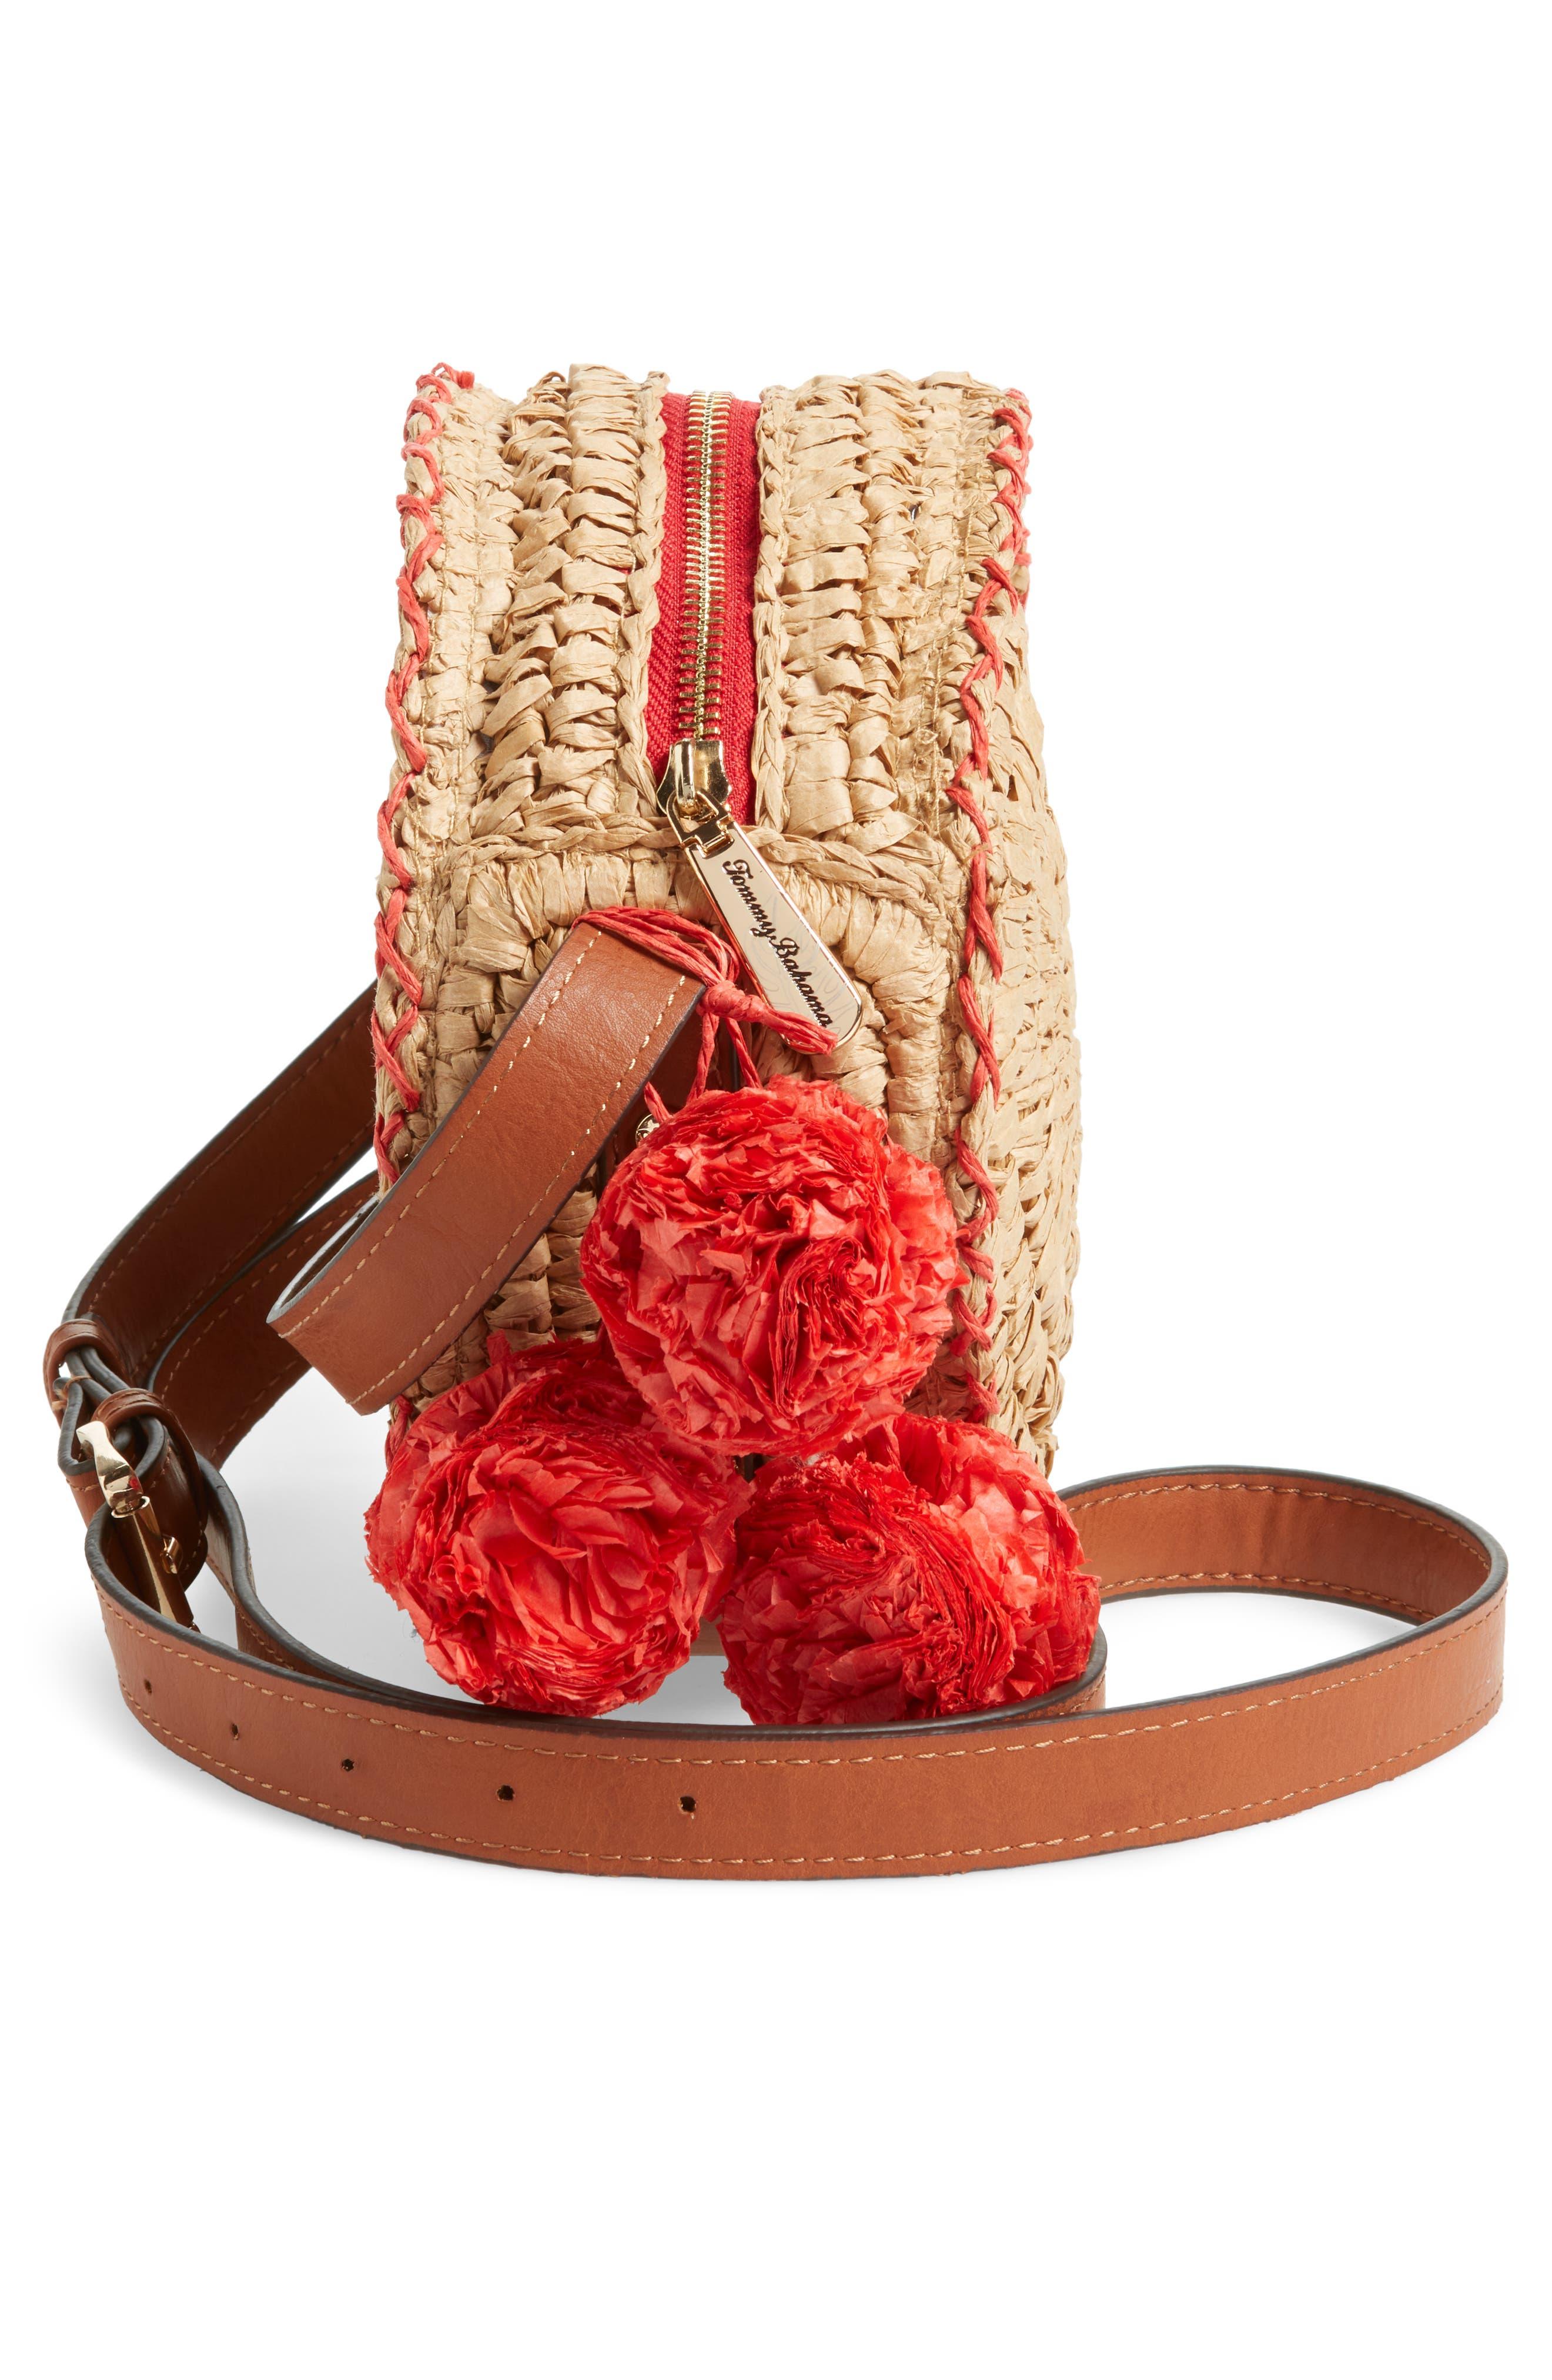 Pirro Woven Straw Crossbody Bag,                             Alternate thumbnail 5, color,                             237